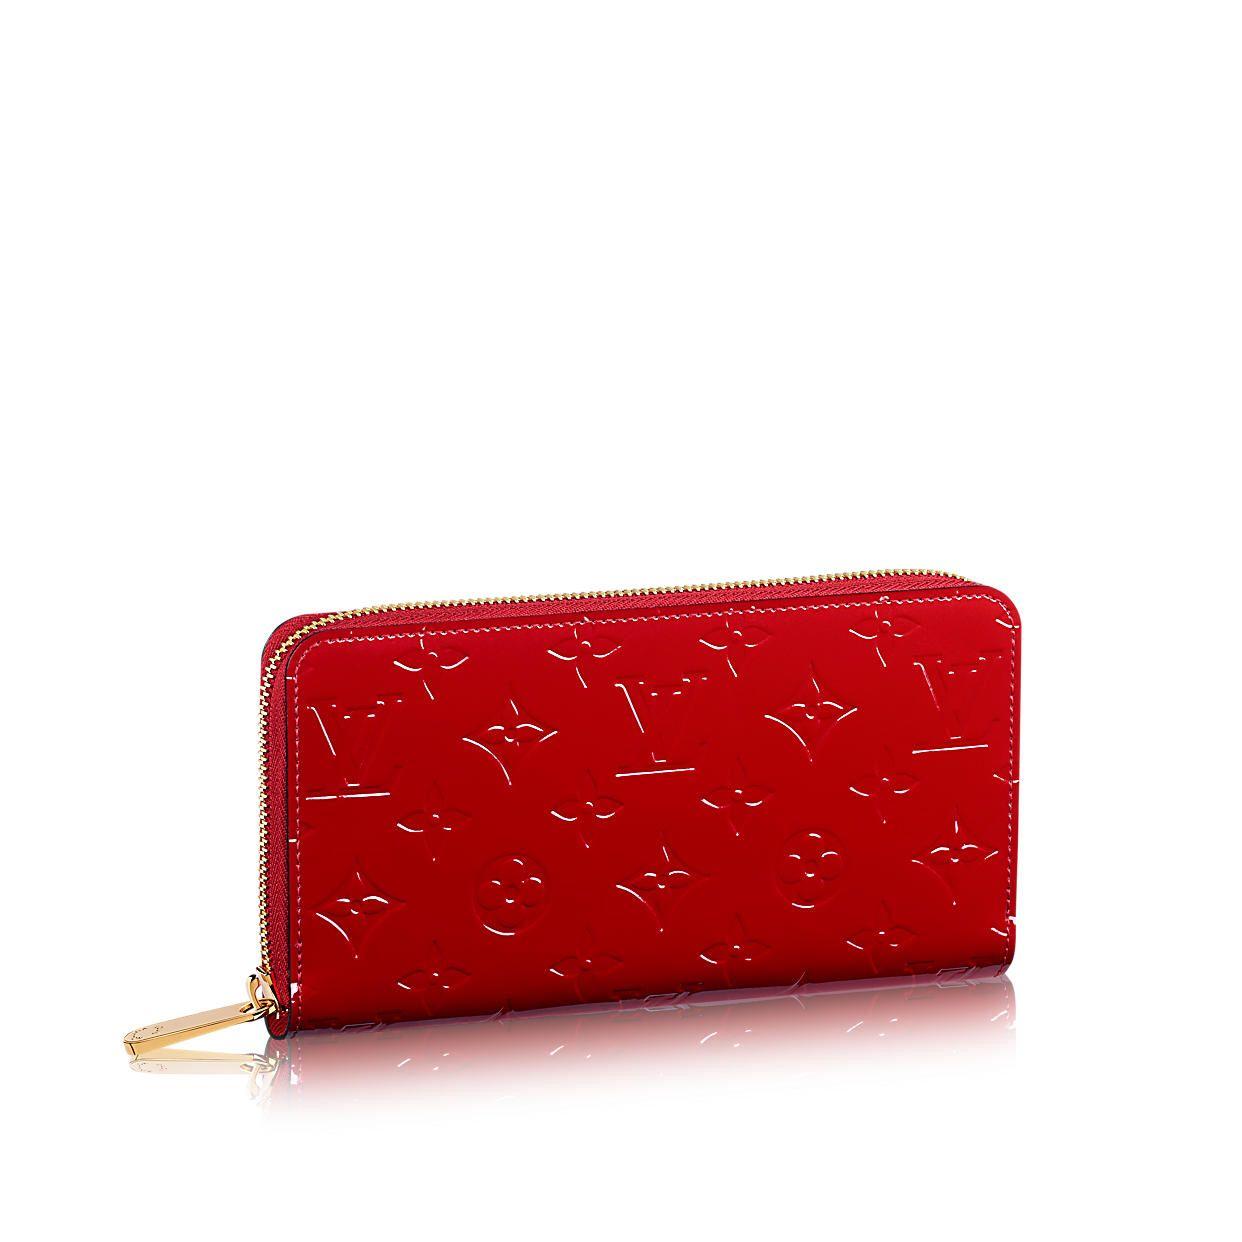 671581d0ed9b Louis Vuitton Zippy Wallet